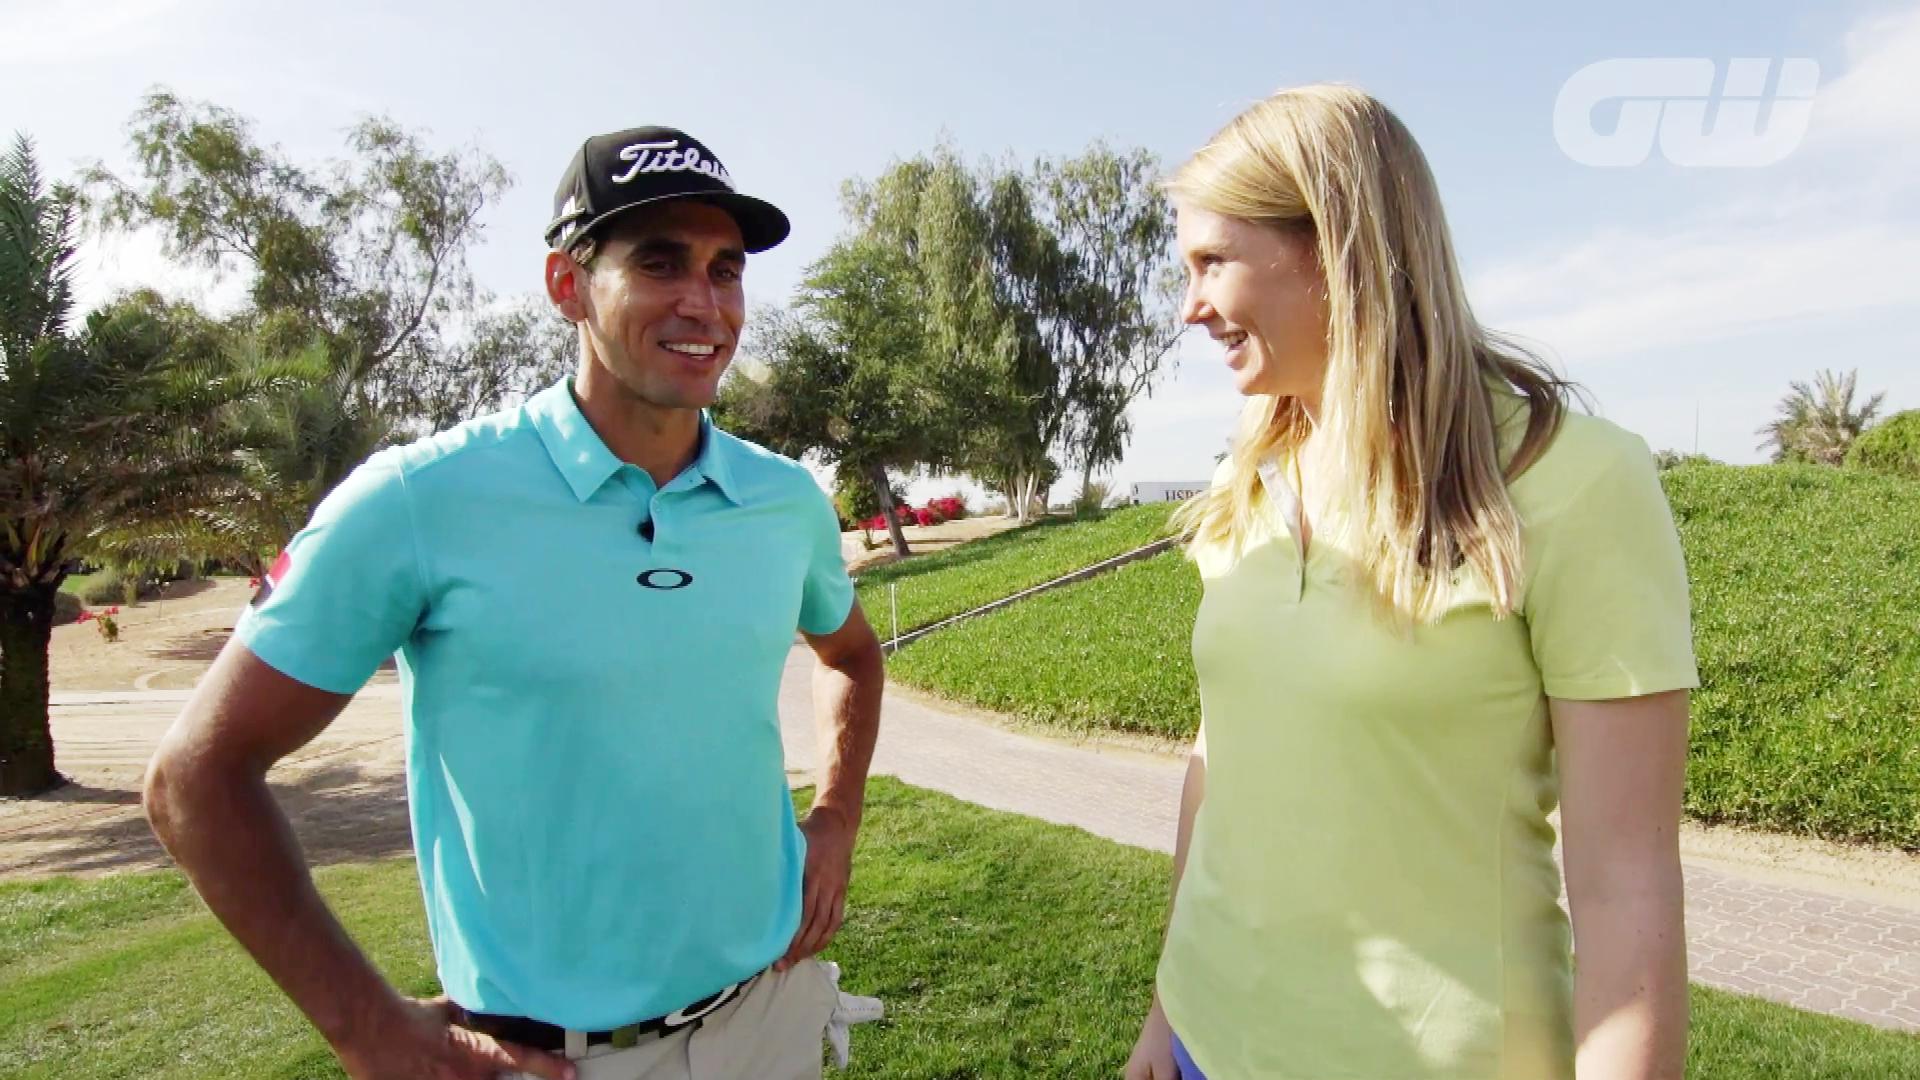 http://www golfchannel com/media?guid